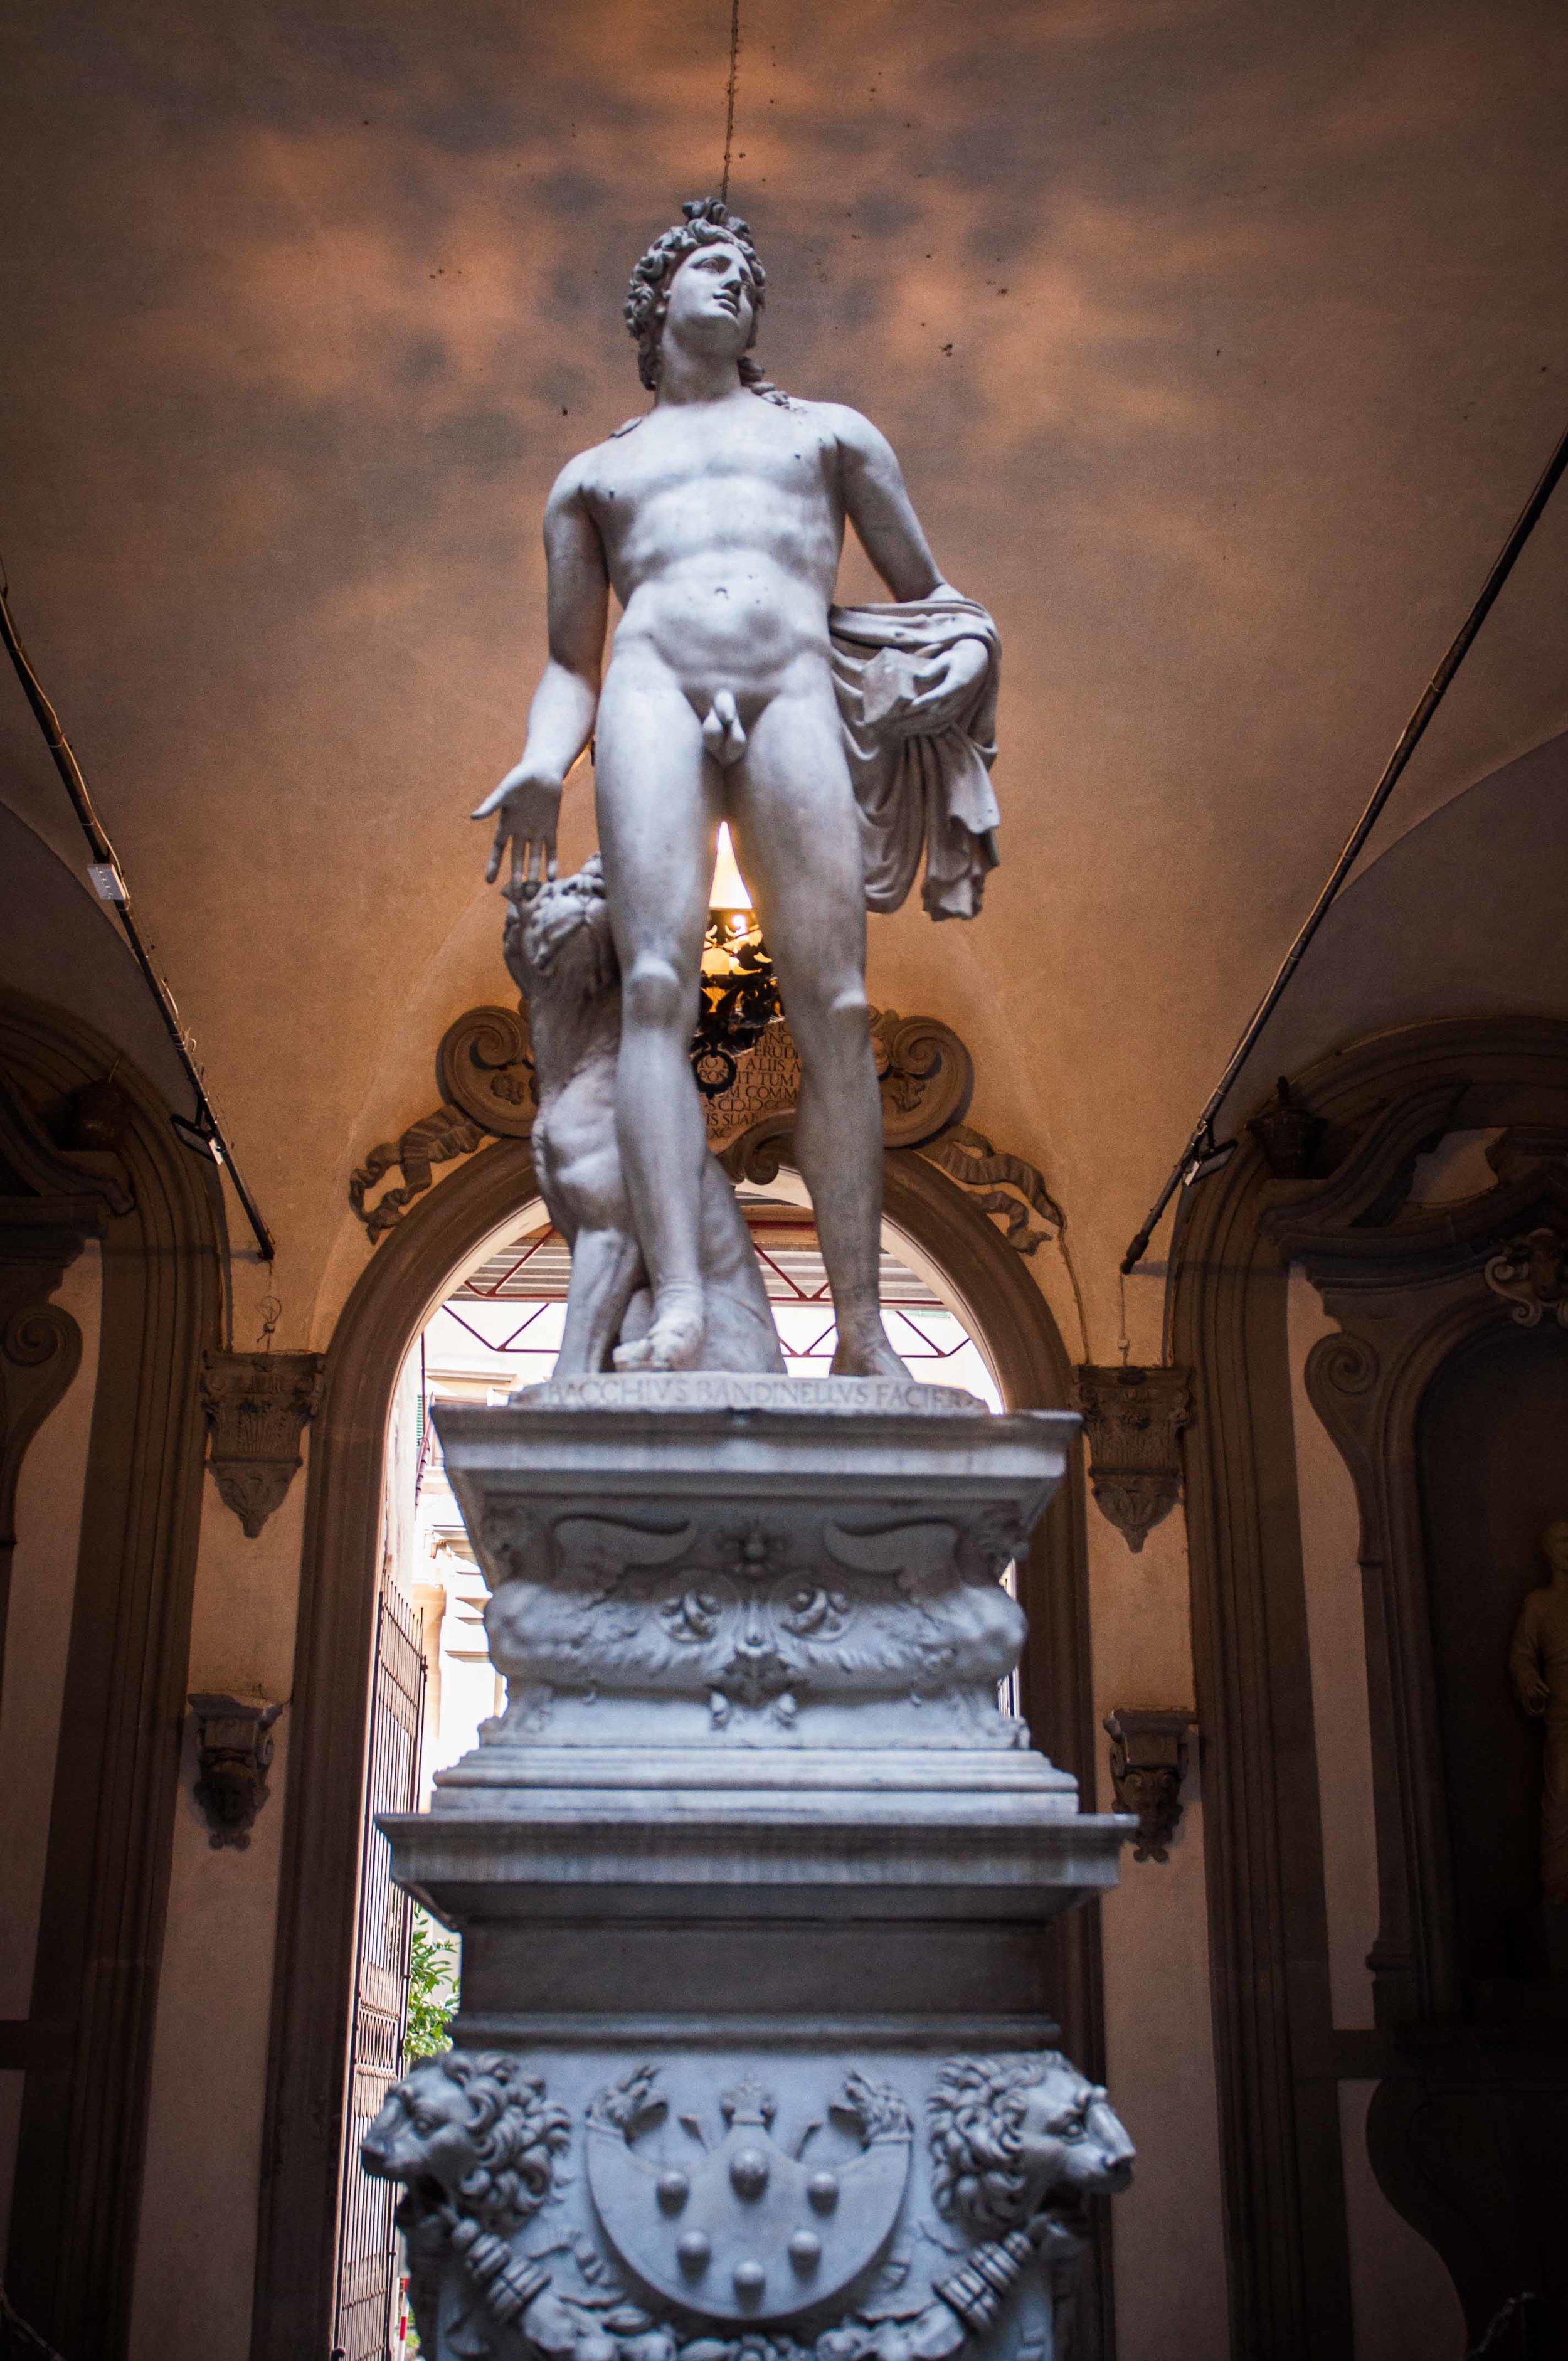 Florence-Some-random-dude-statue.jpg